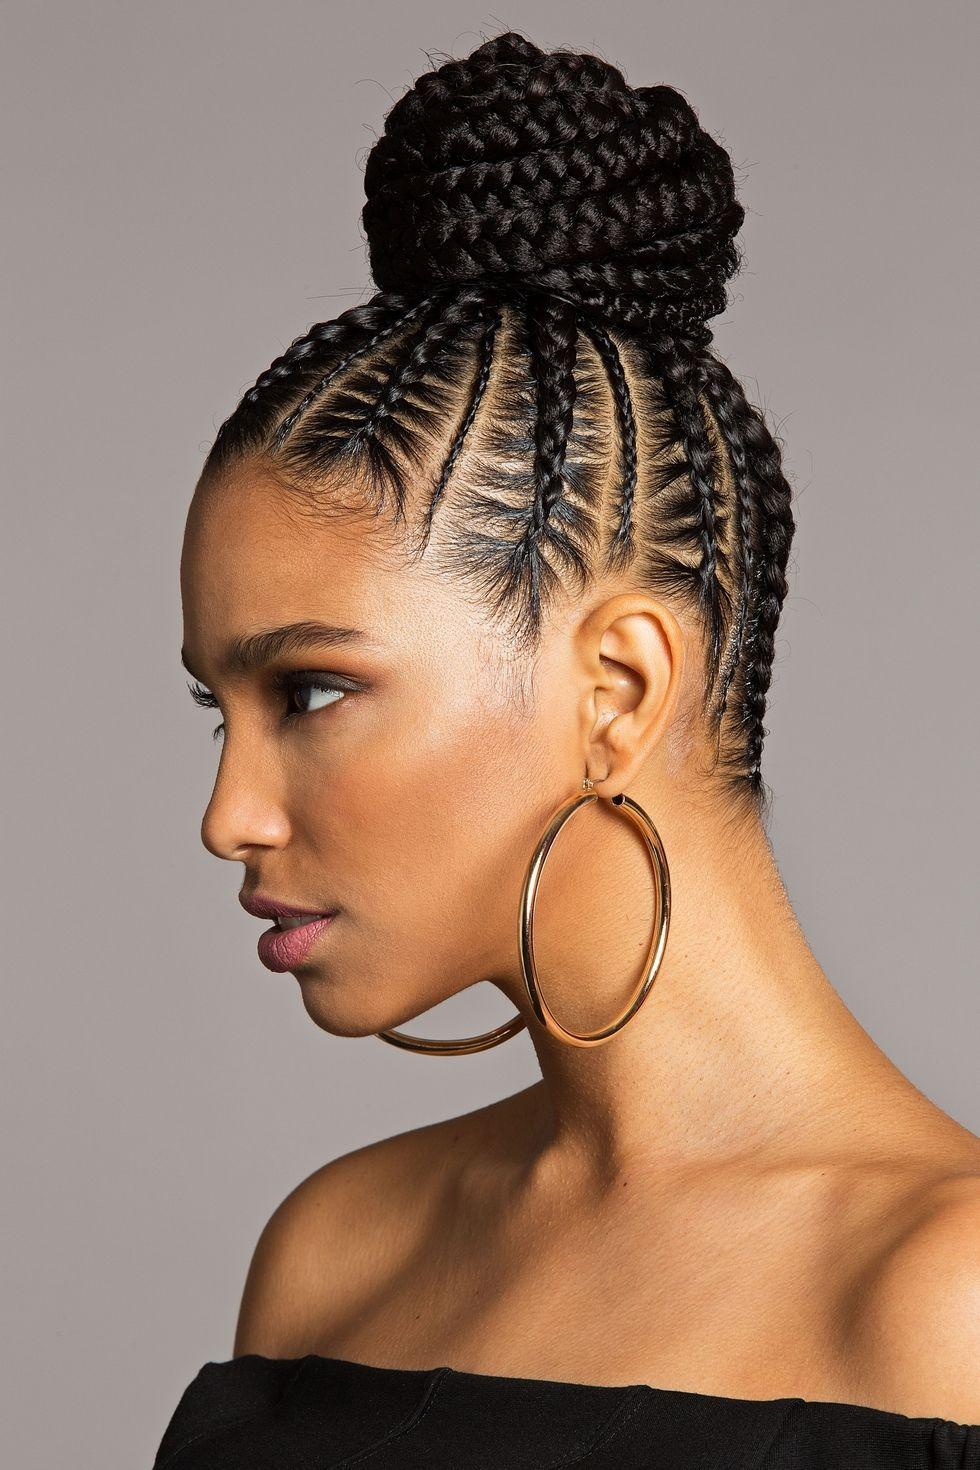 Legit The 3 Prettiest Braided Buns You Ll Ever Copy Hair Styles Natural Hair Styles Natural Hair Braids